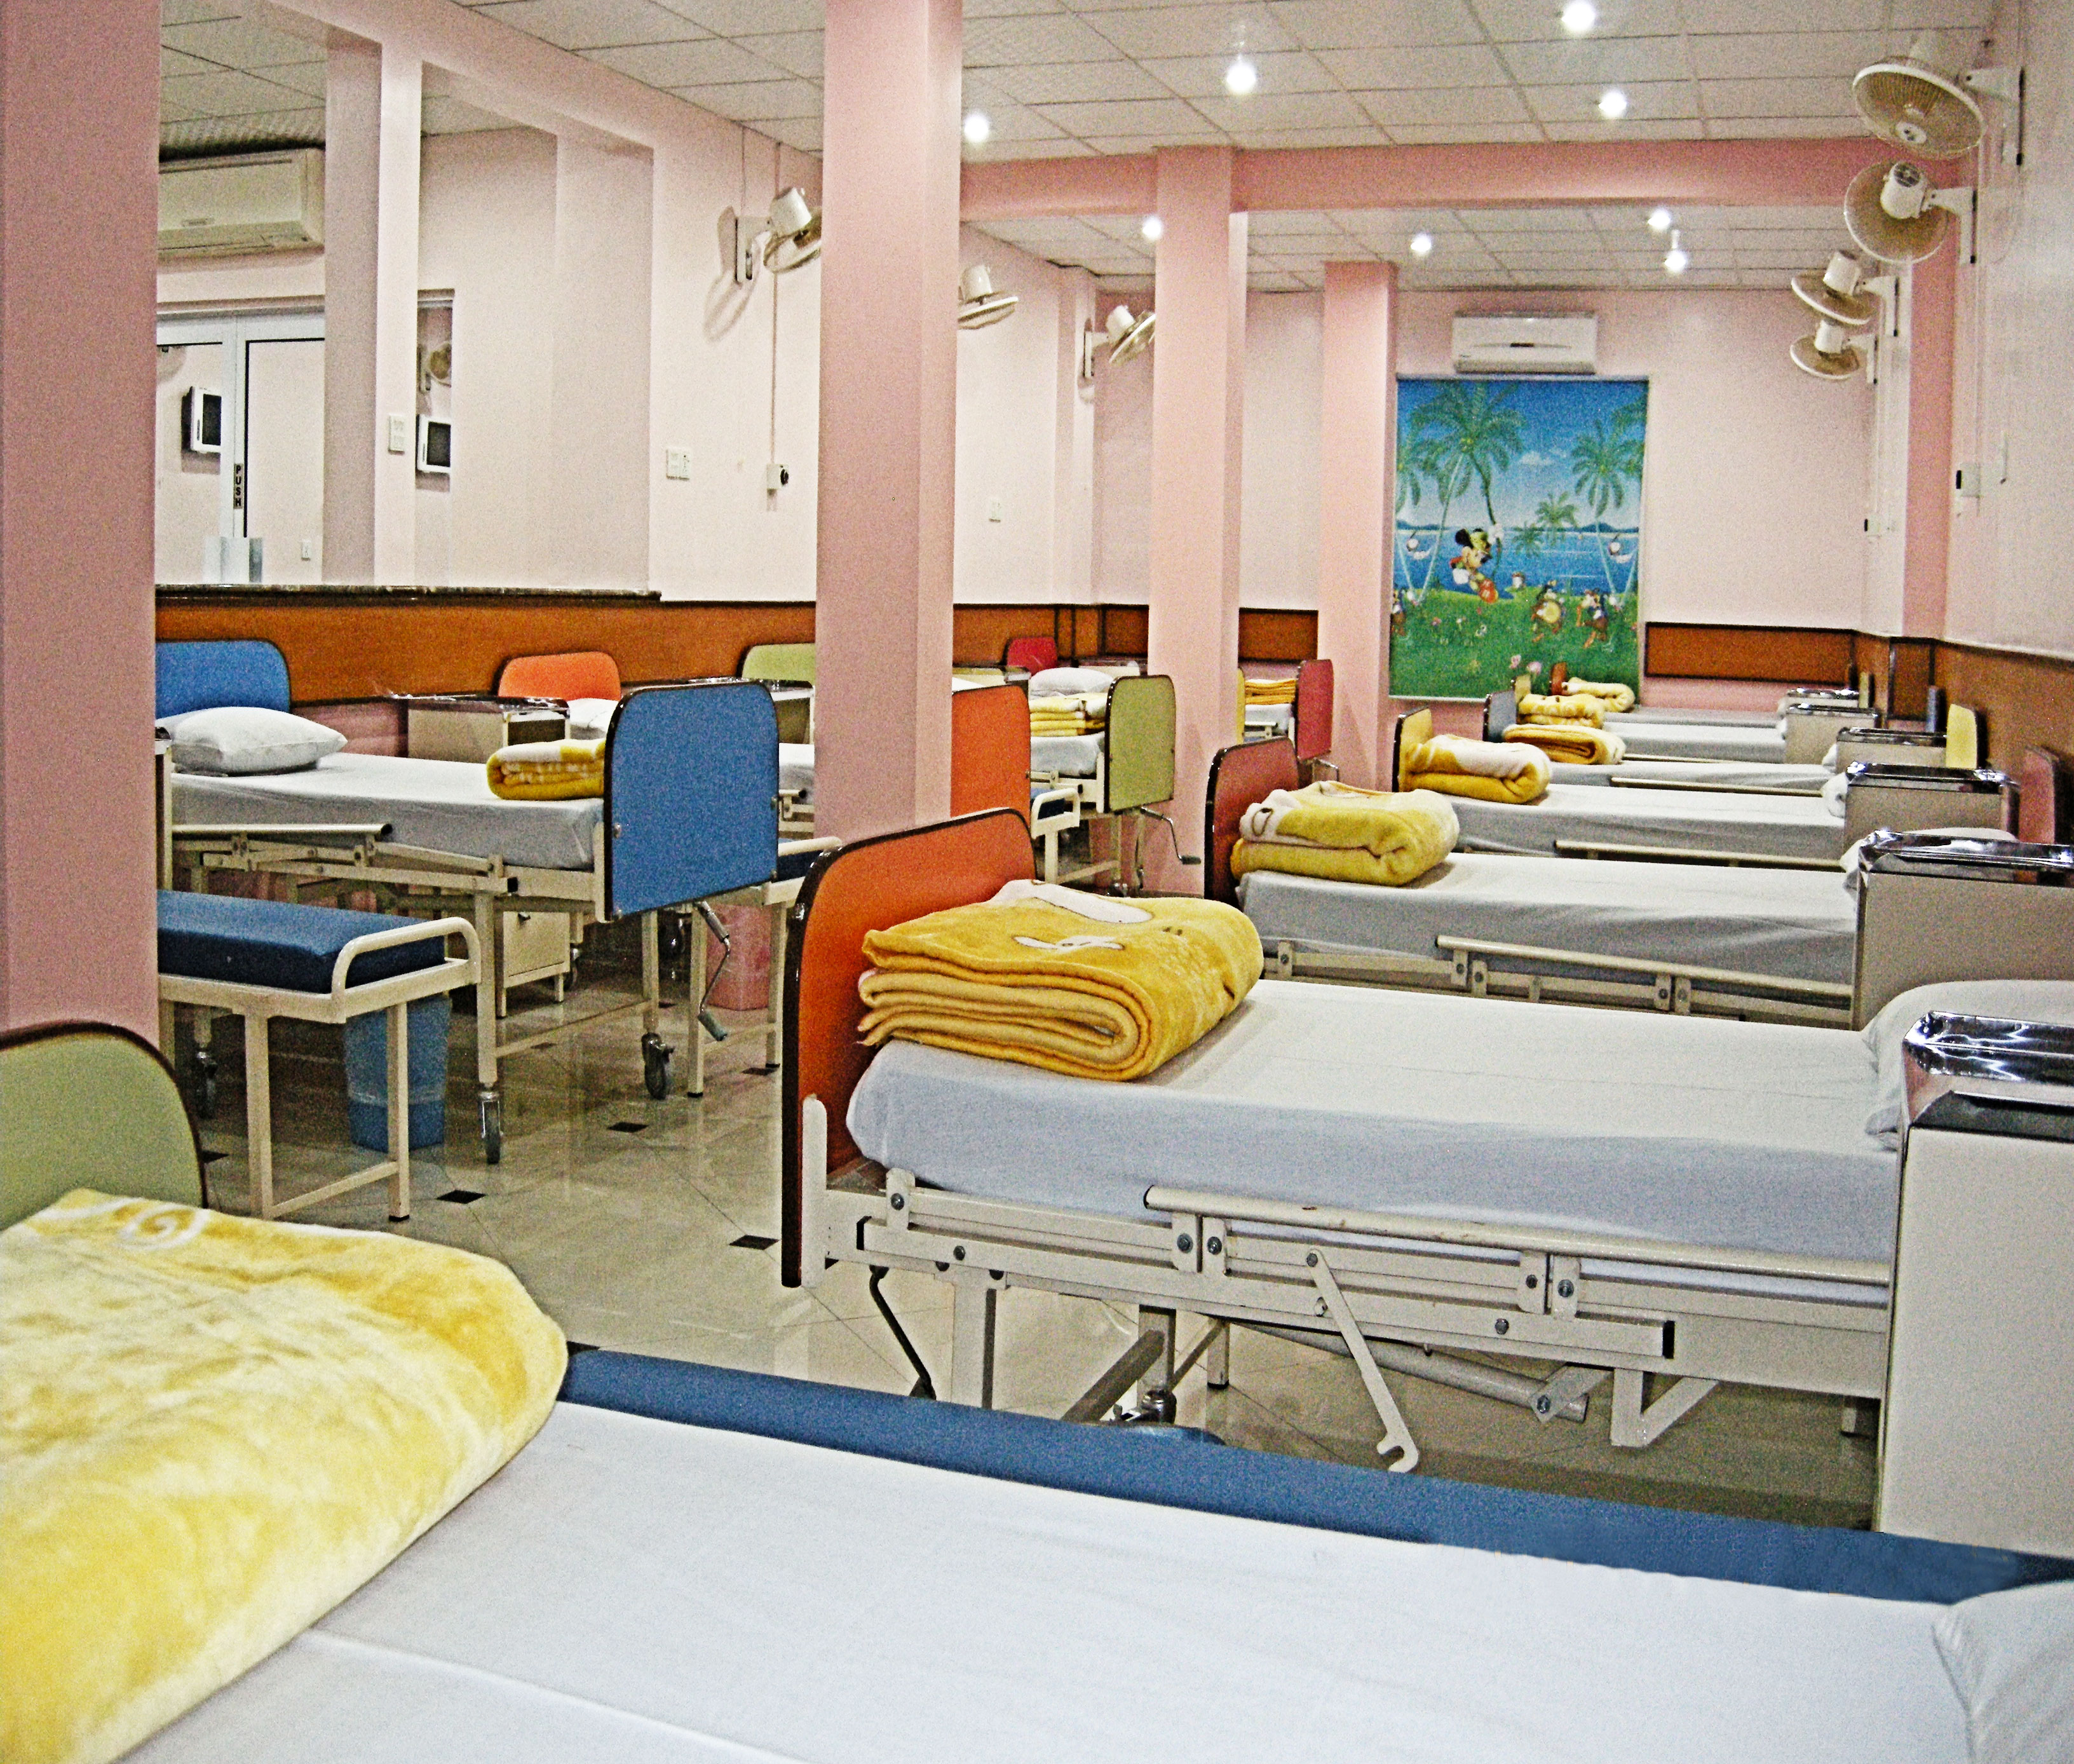 Saifee Hospital Karachi